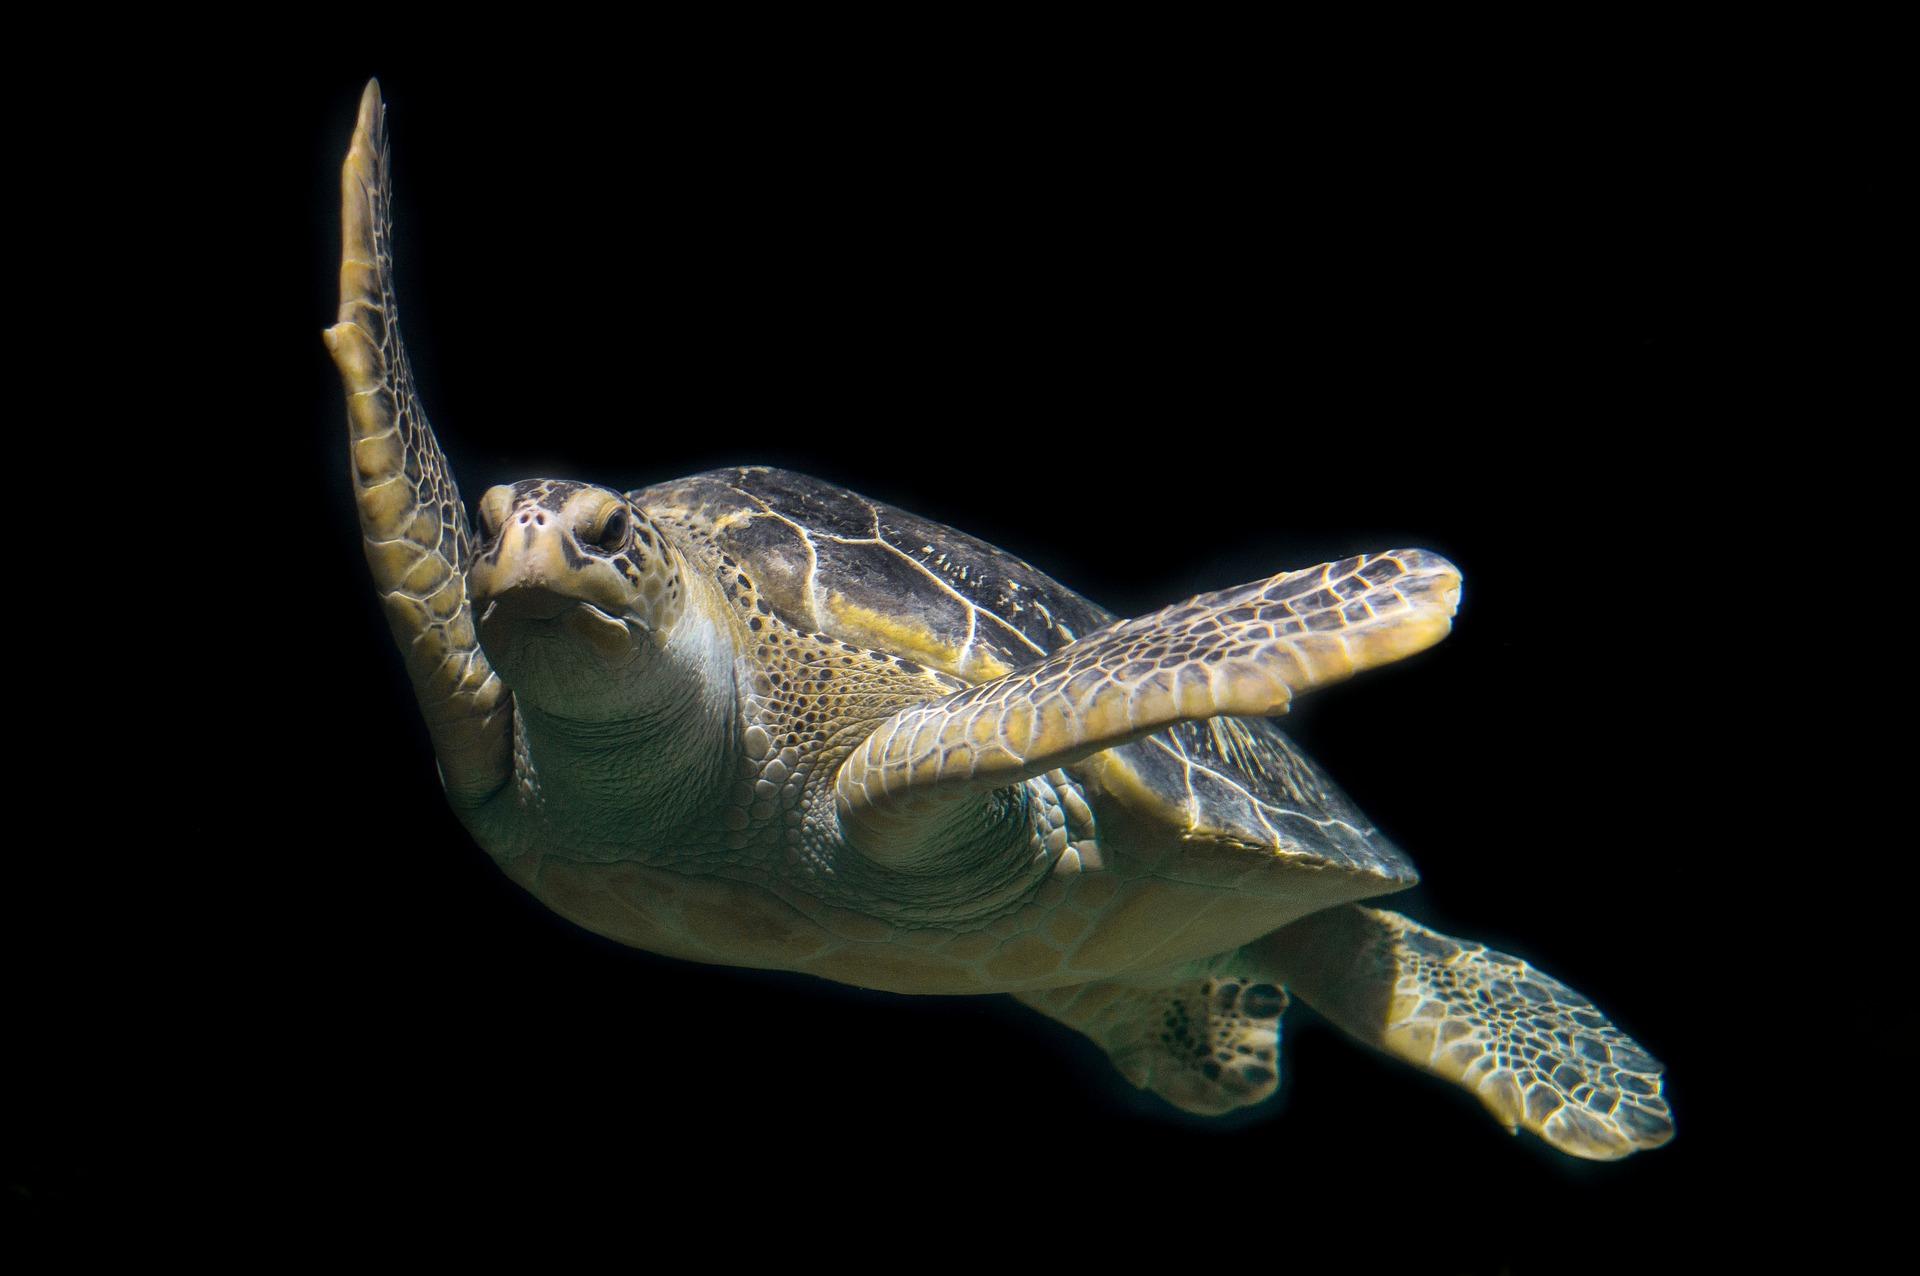 ISLAND HEIGHTS: Turtle Trouble